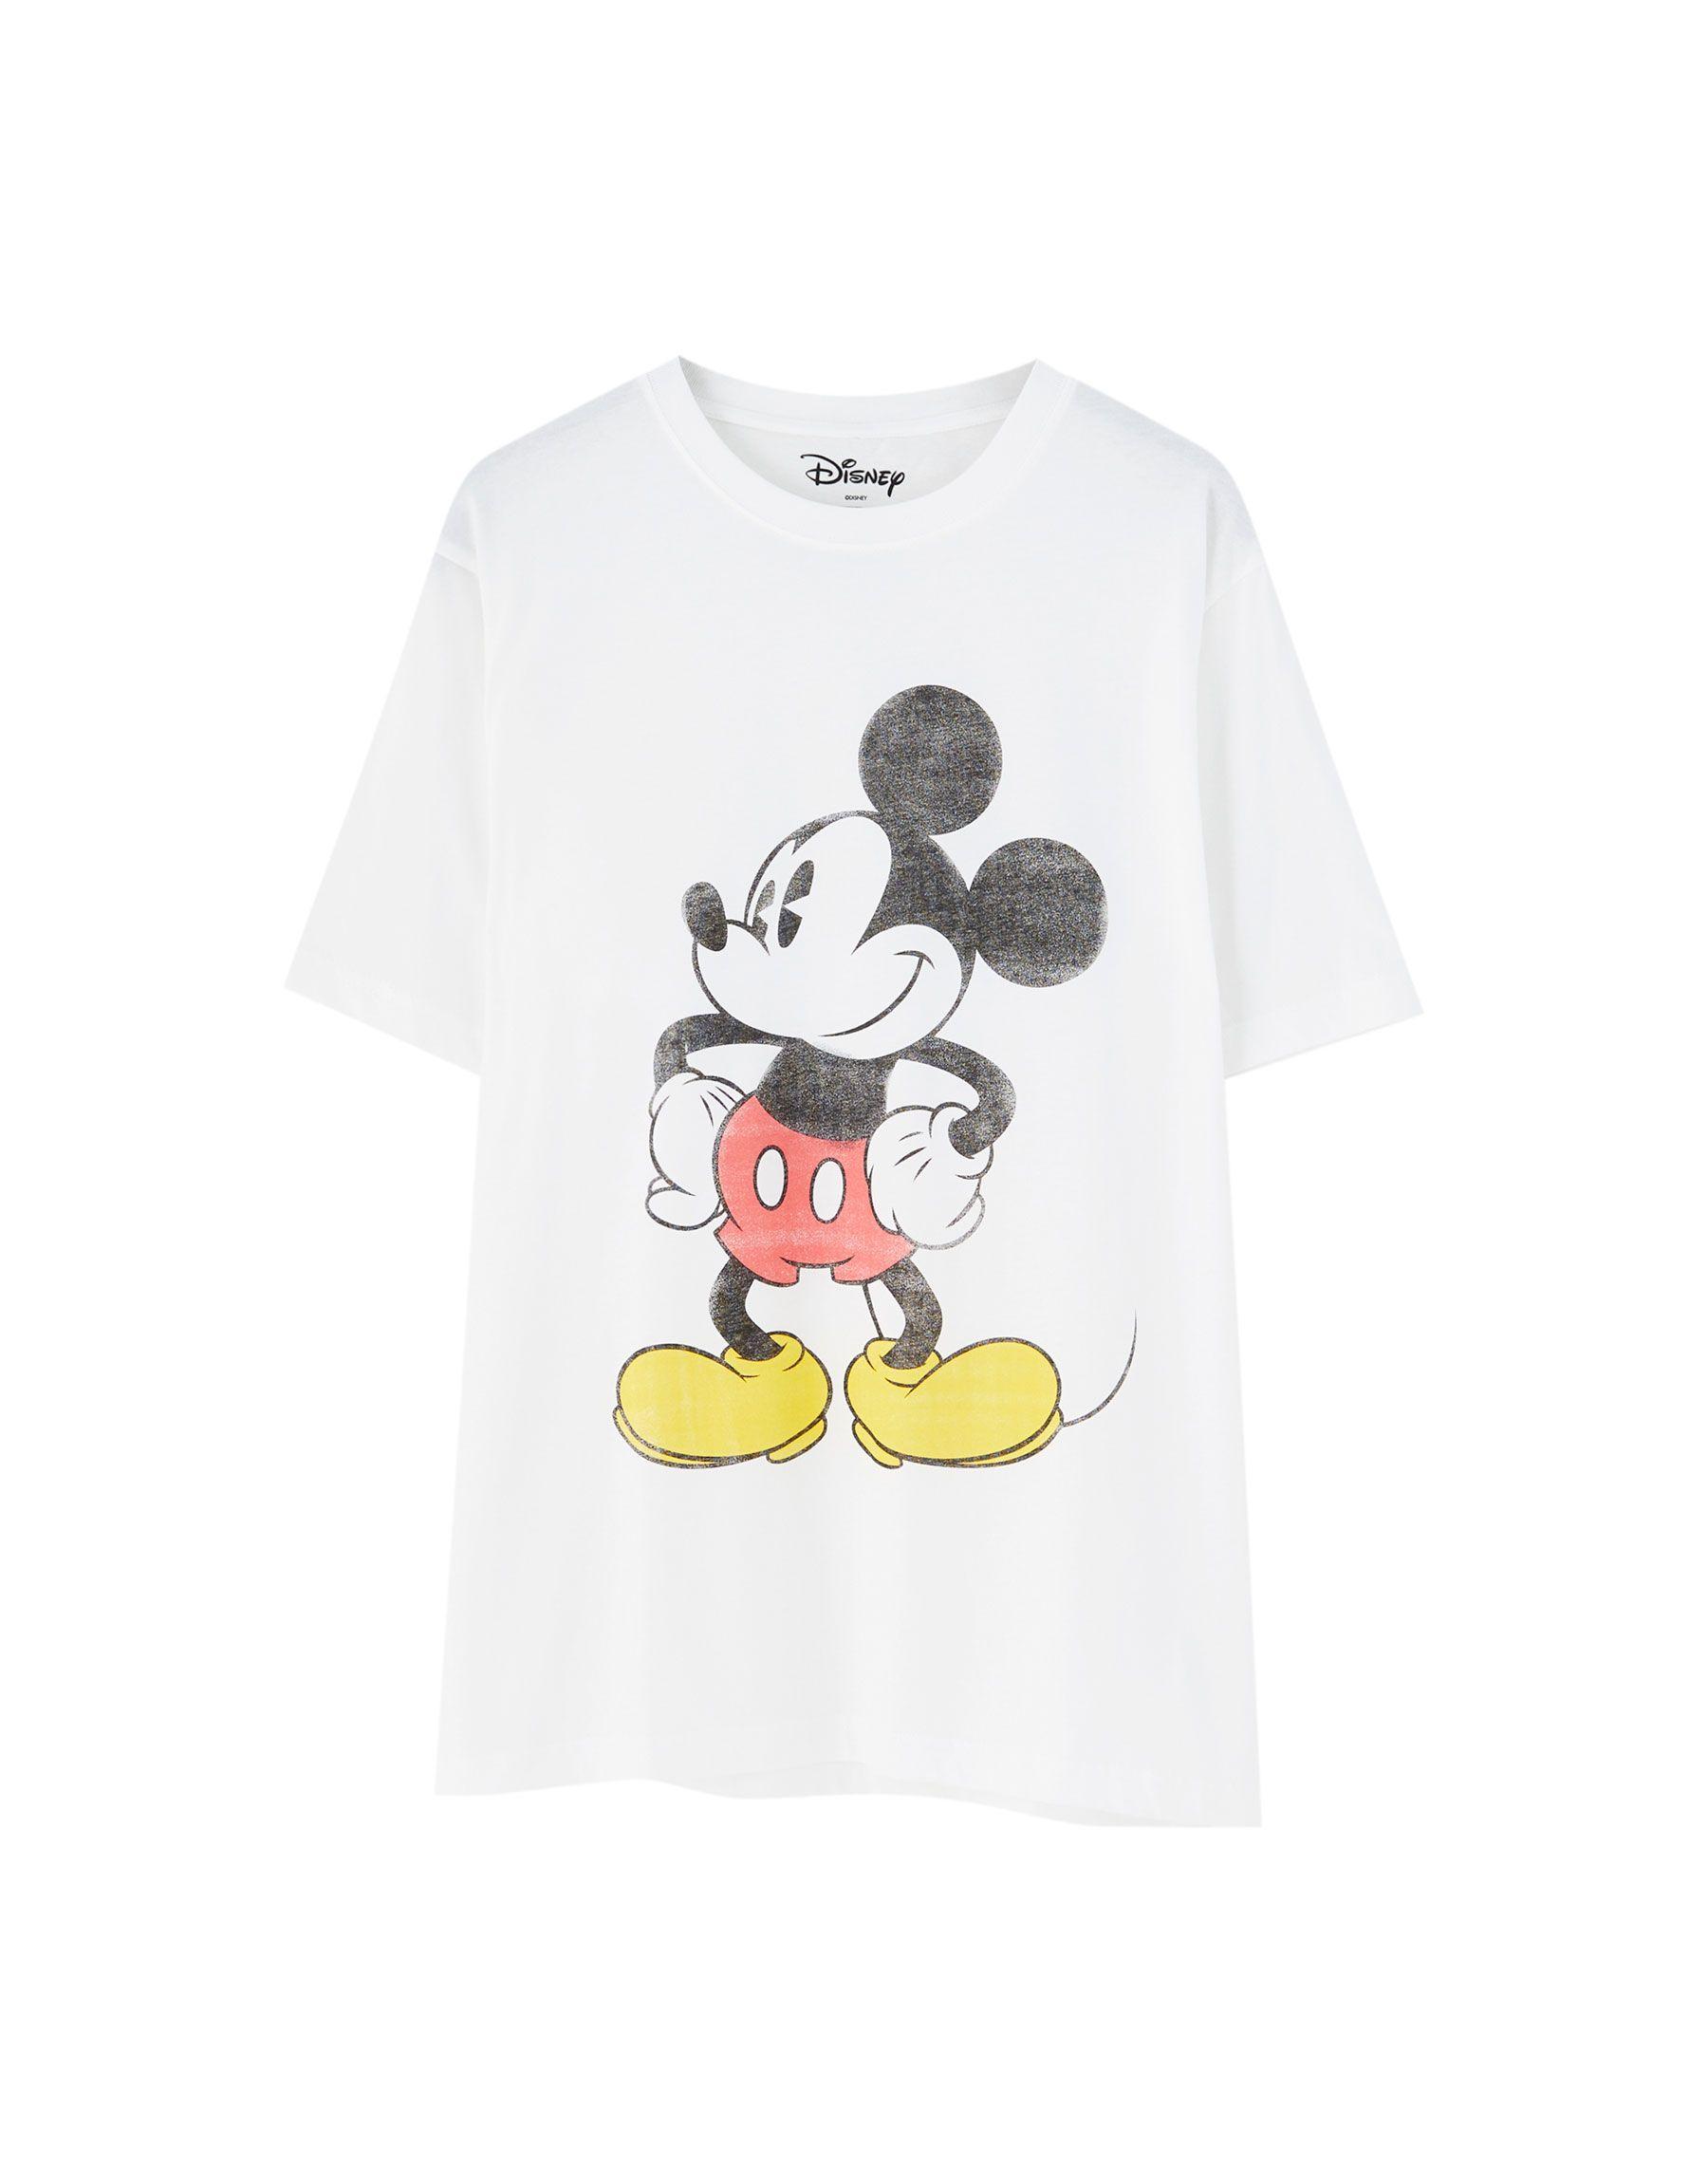 Para estrenar 791d5 b6dfa Camiseta Mickey Mouse básica   Products in 2019   Mens tops ...